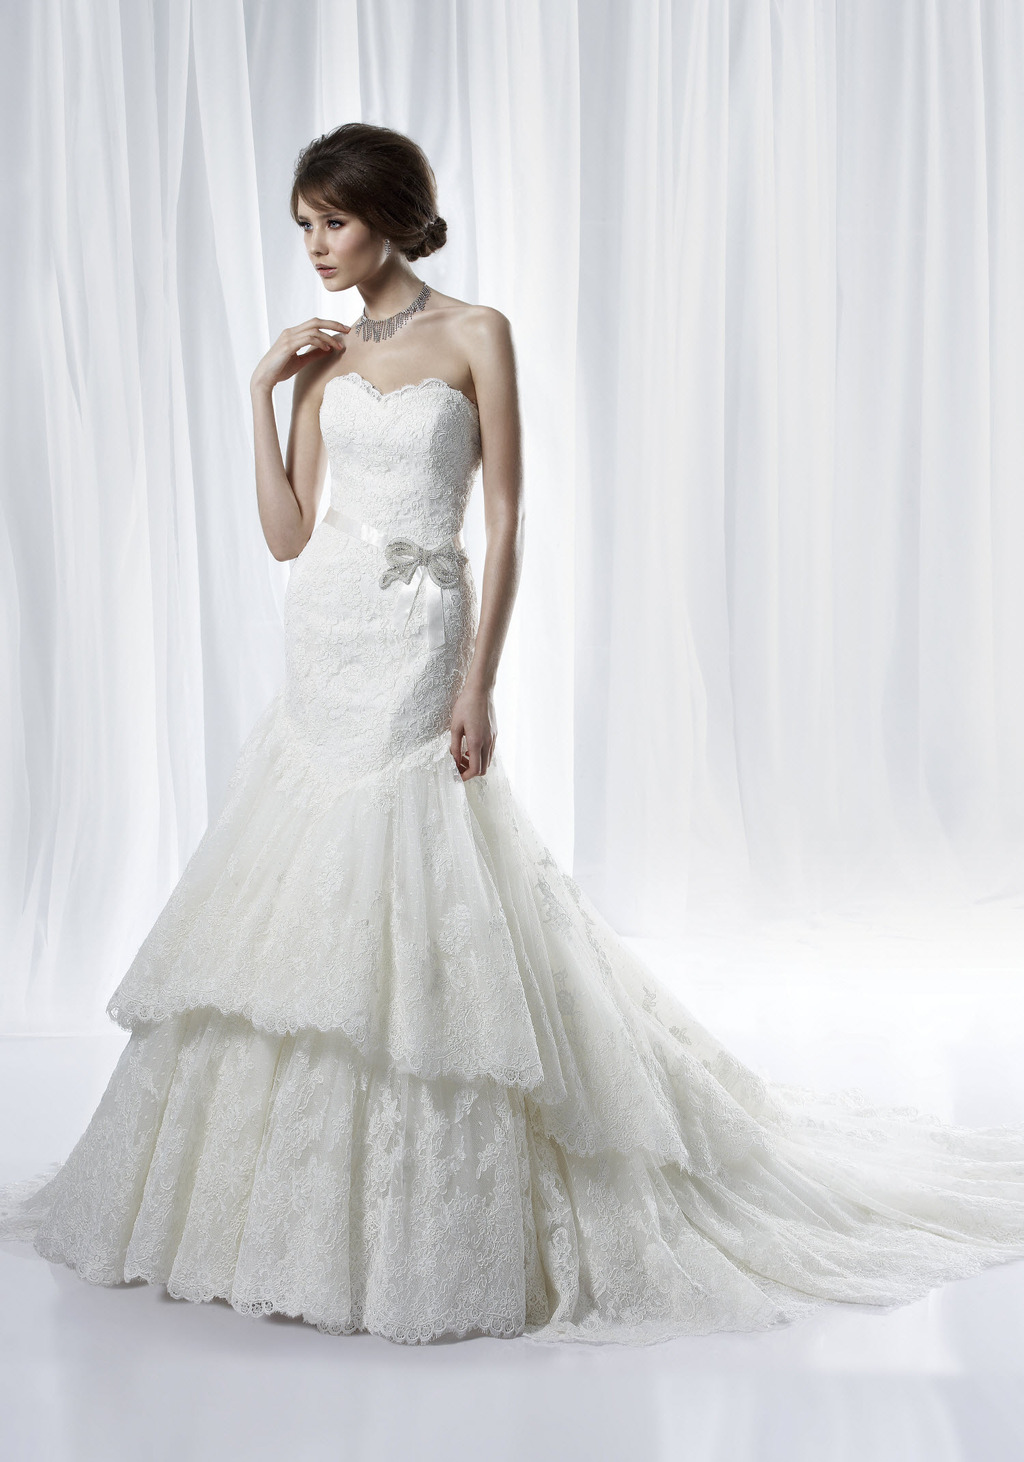 2012-wedding-dress-anjolique-bridal-gowns-romantic-lace.full